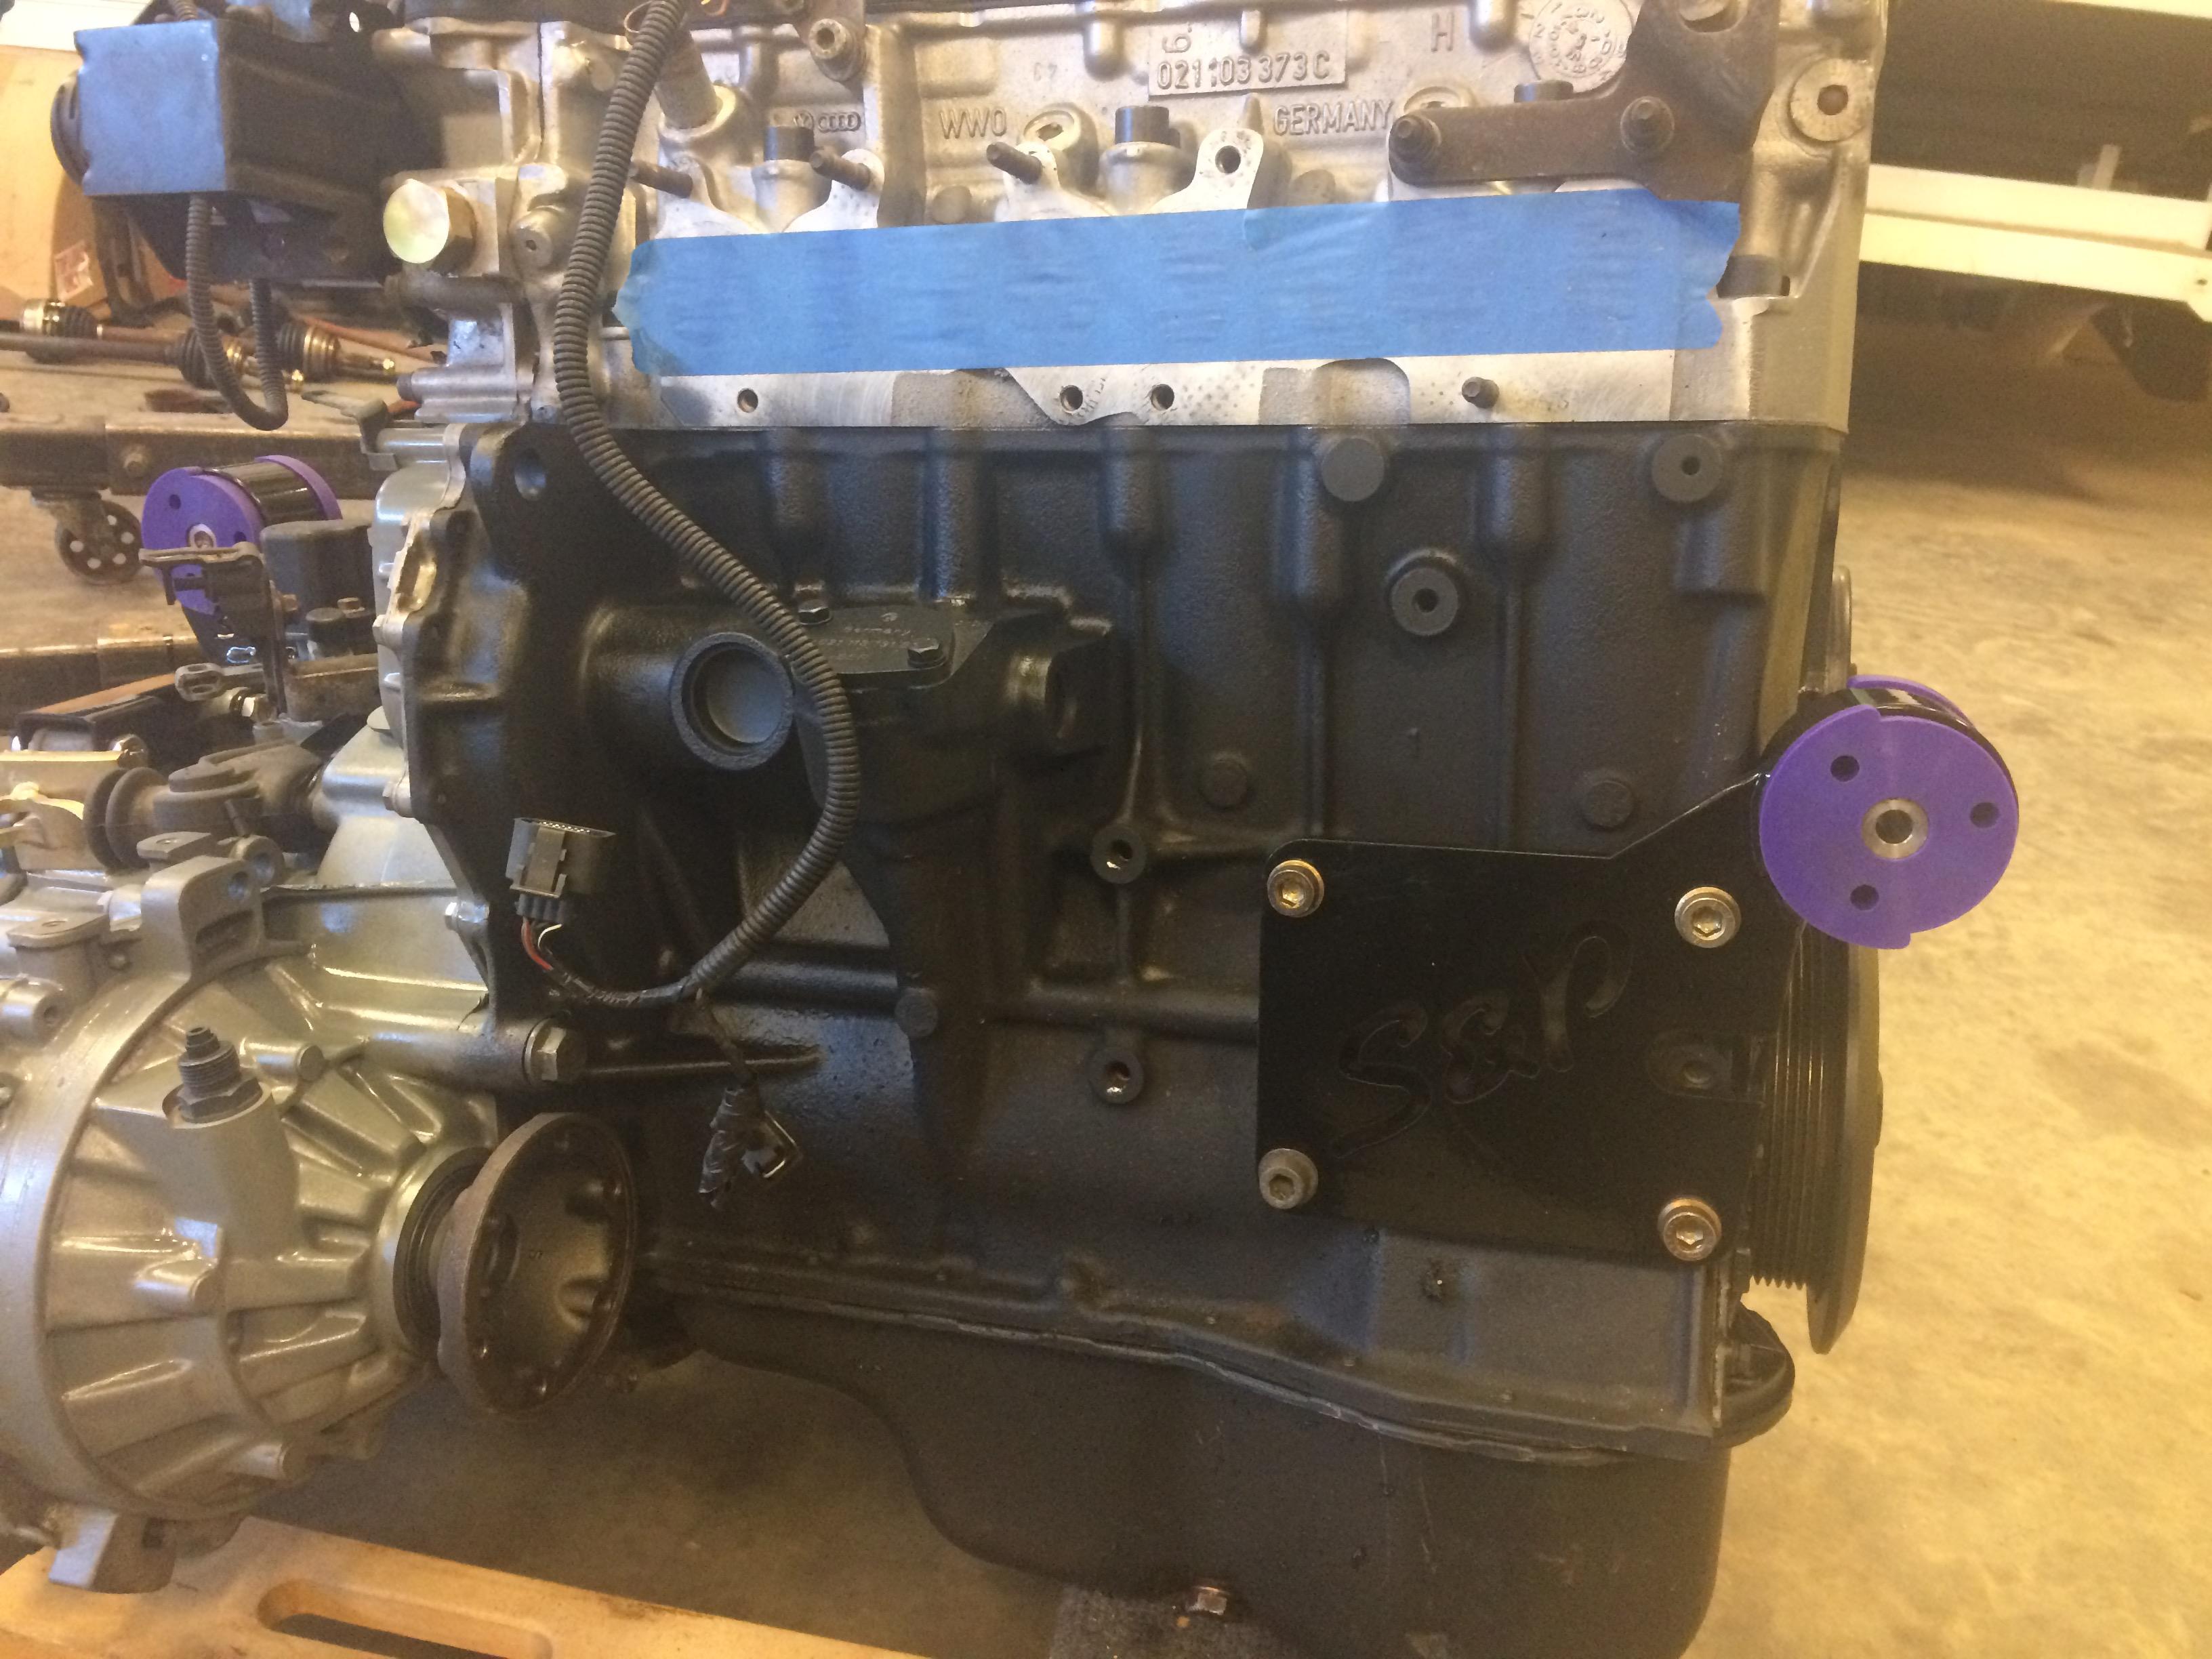 vw wiring harness kits mk1 vr6 bolt in conversion kit     s amp p automotive  mk1 vr6 bolt in conversion kit     s amp p automotive